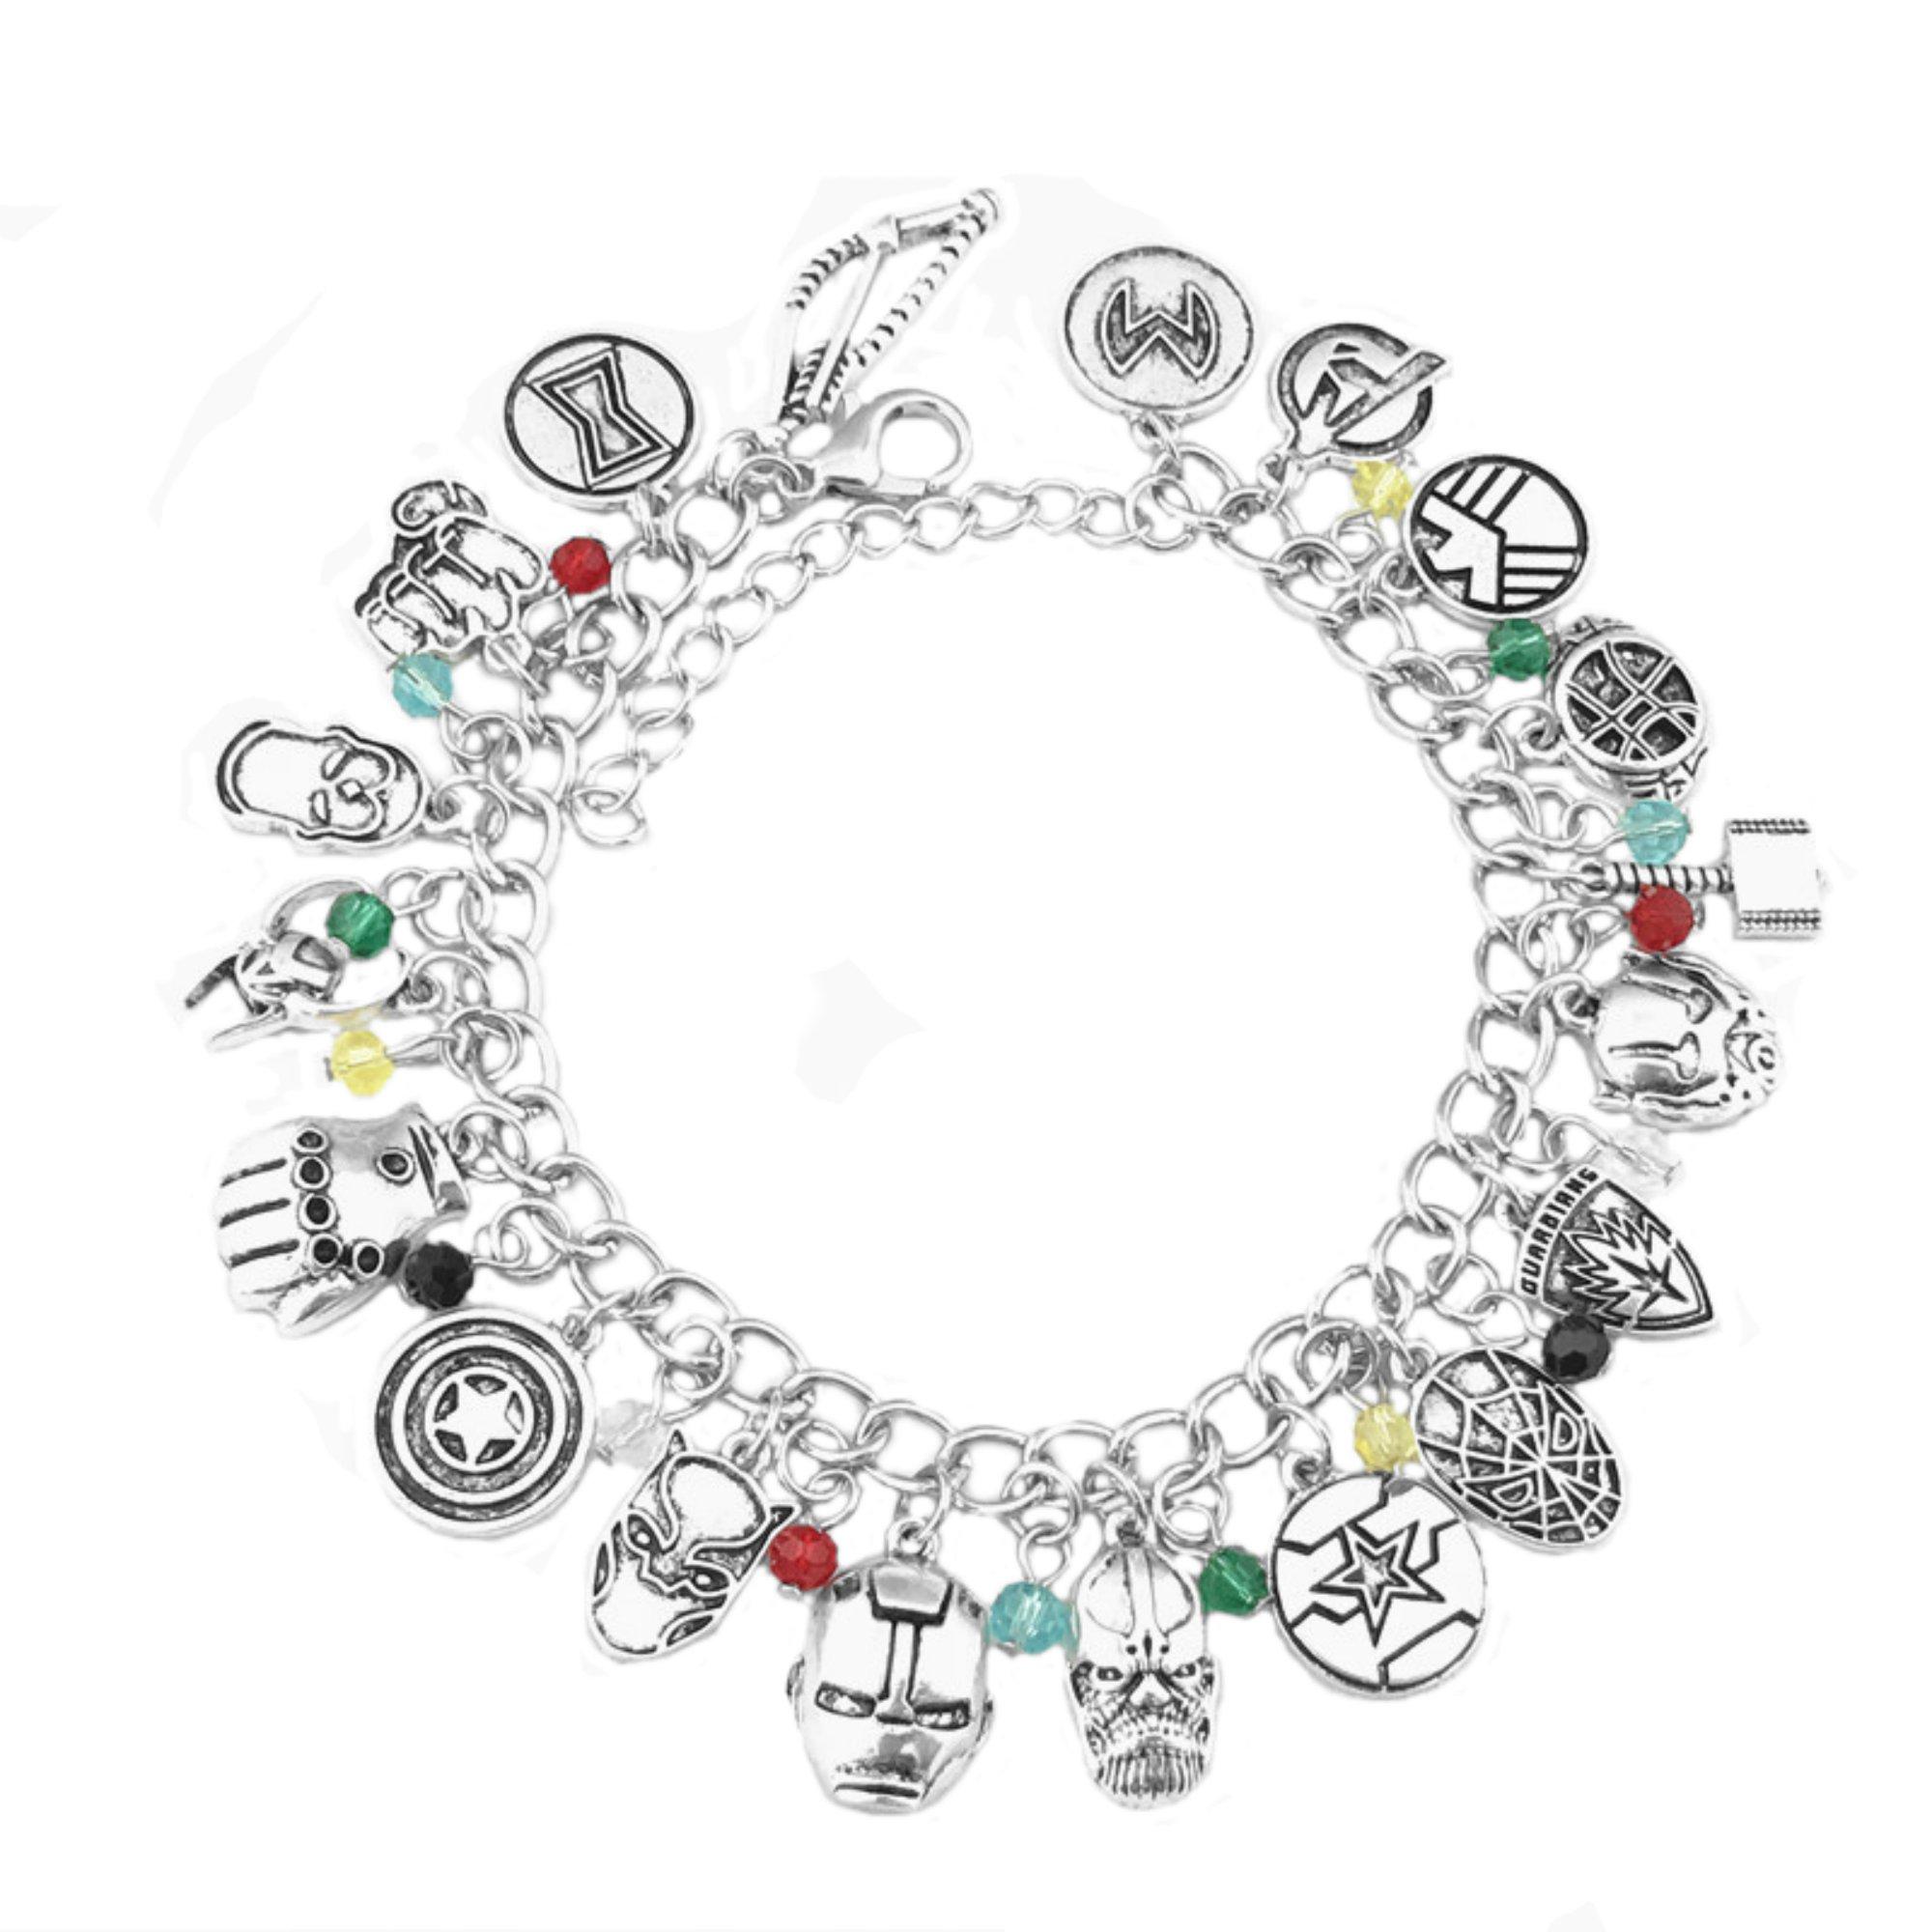 Infinity War Charm Bracelet Marvel Comics 2018 Movies Cartoons Superhero Logo Theme Premium Quality Detailed Cosplay Jewelry Gift Series by Superheroes Brand